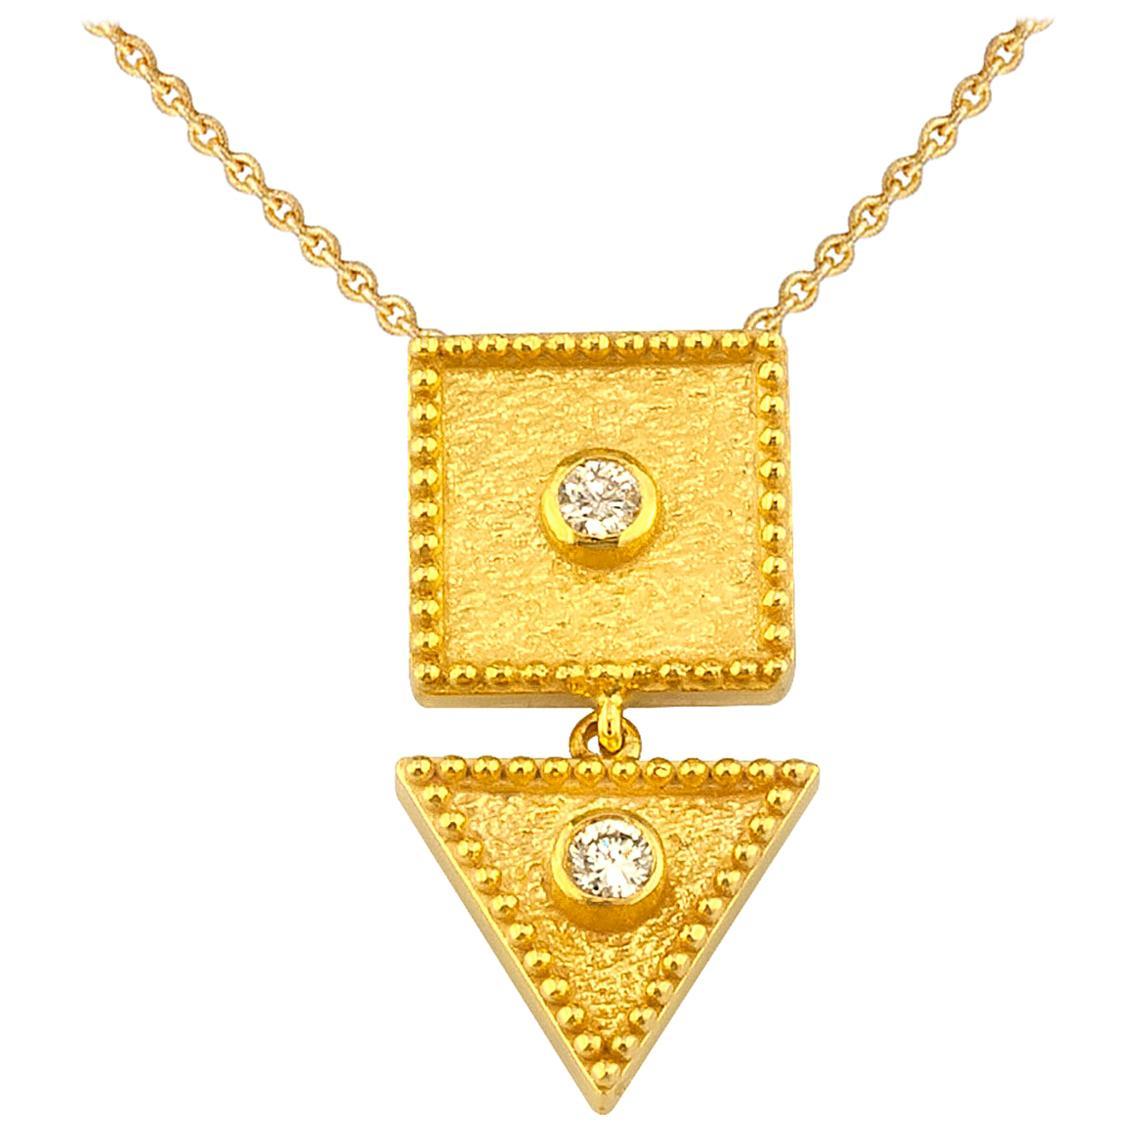 Georgios Collections 18 Karat Yellow Gold Drop Diamond Pendant Necklace Chain